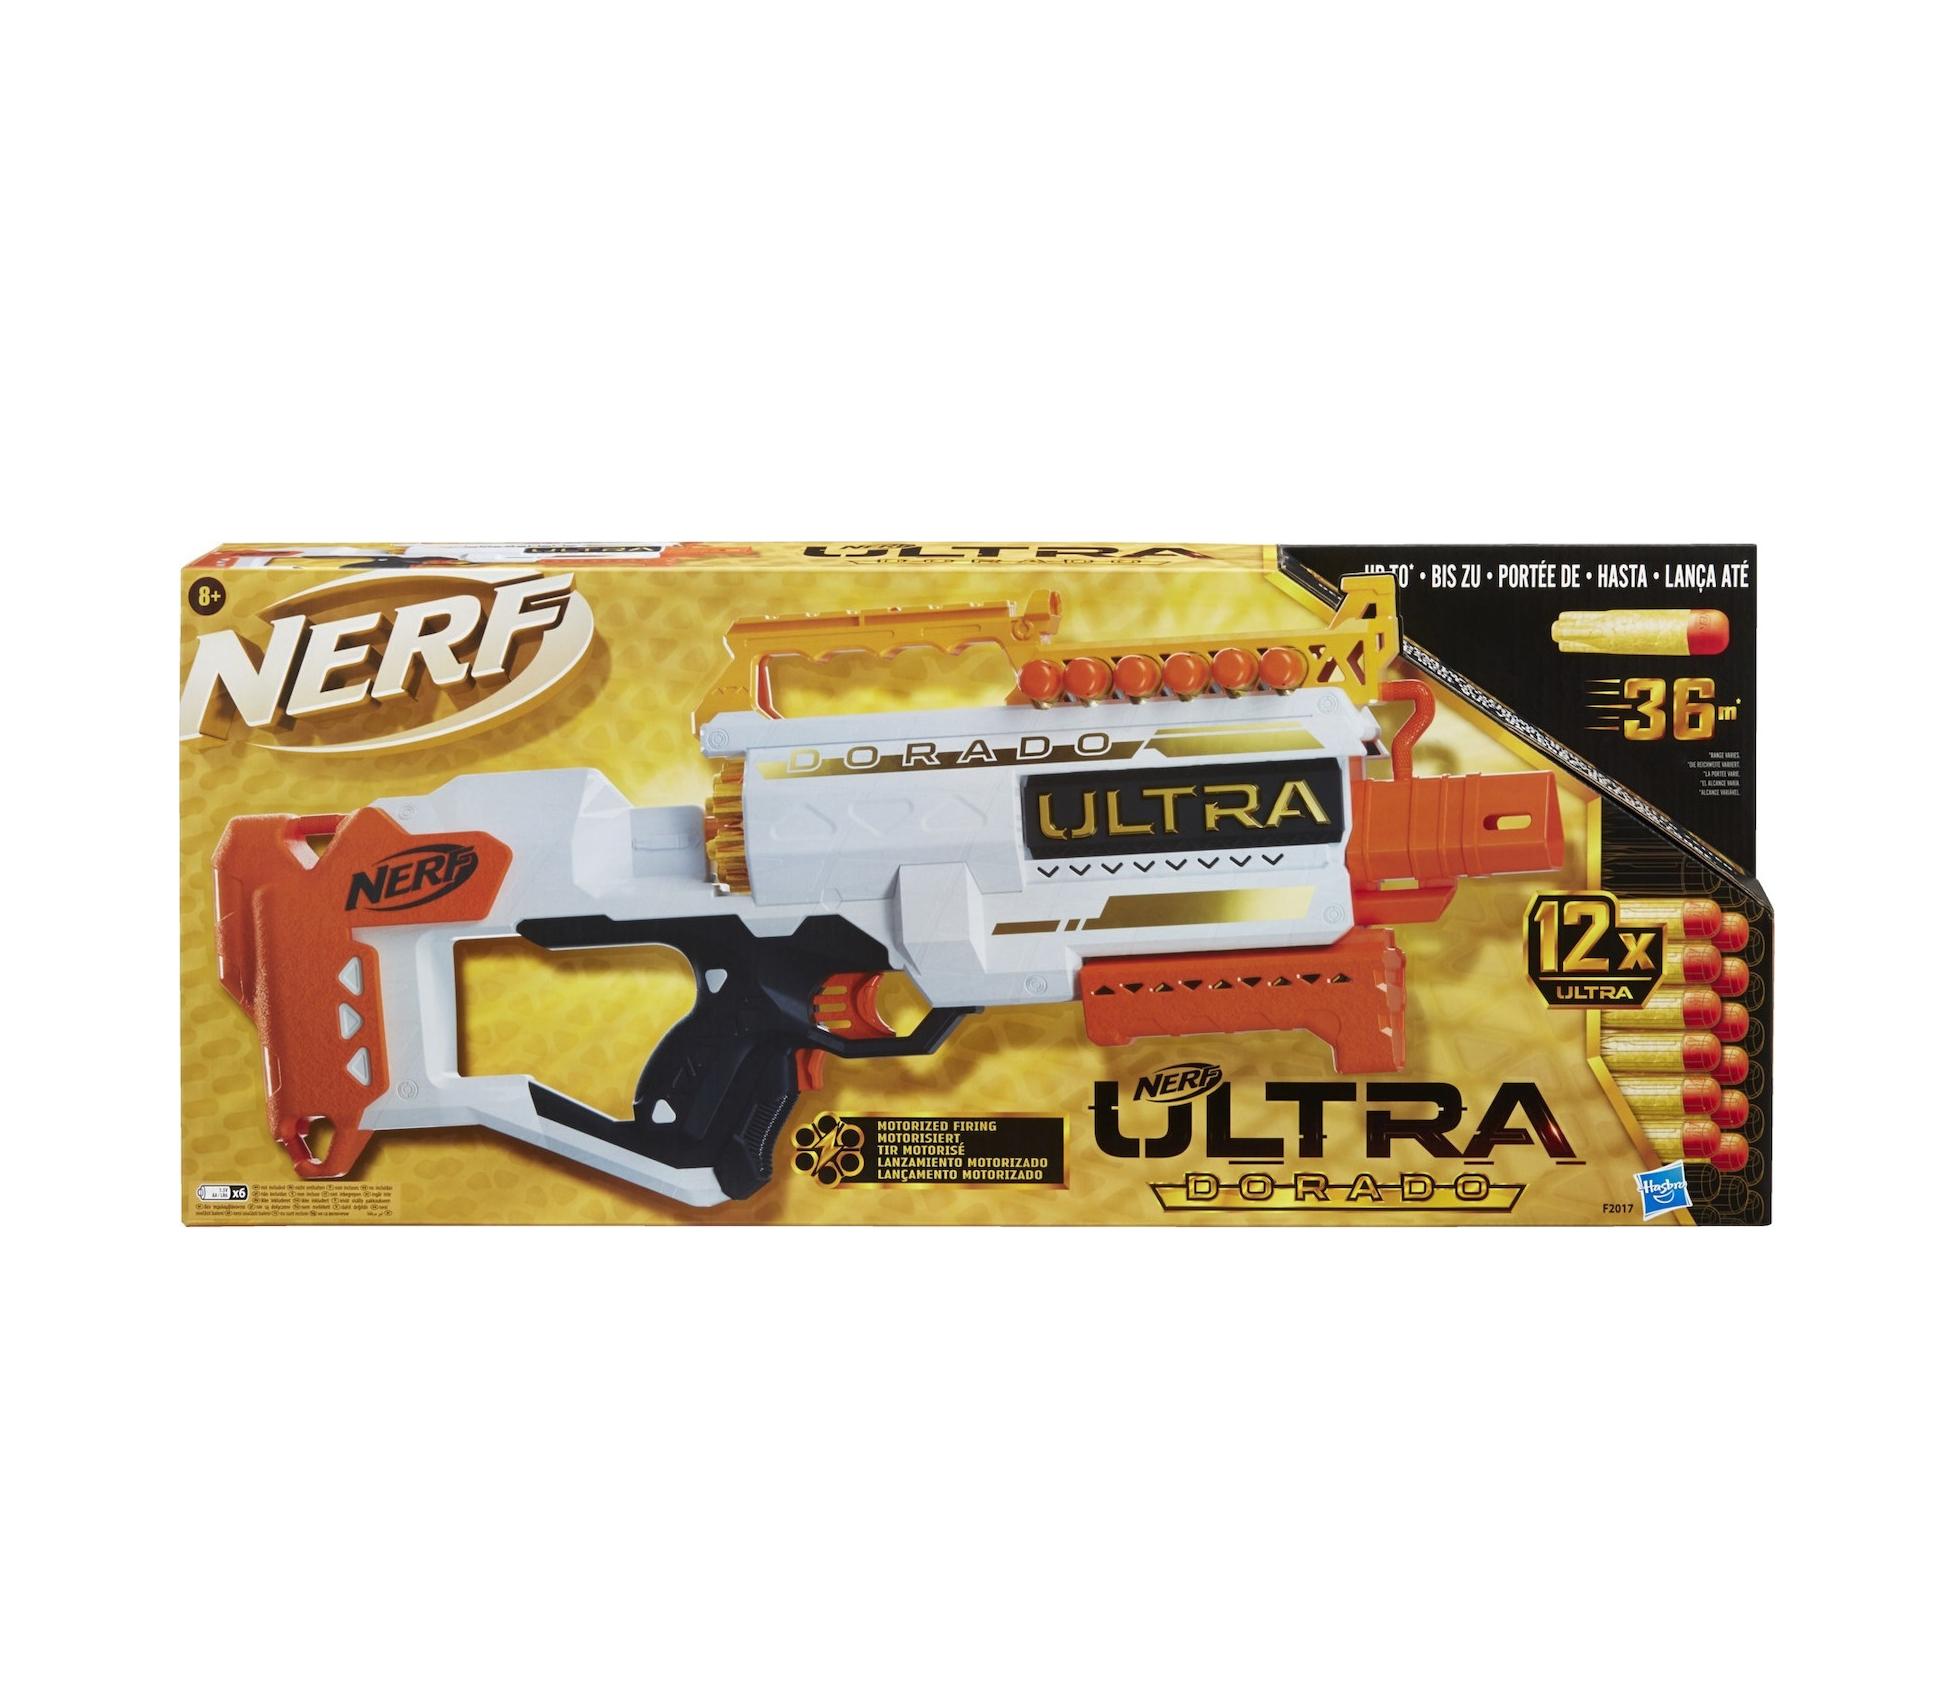 Hasbro Nerf Ultra Dorado with 12 Darts F2017